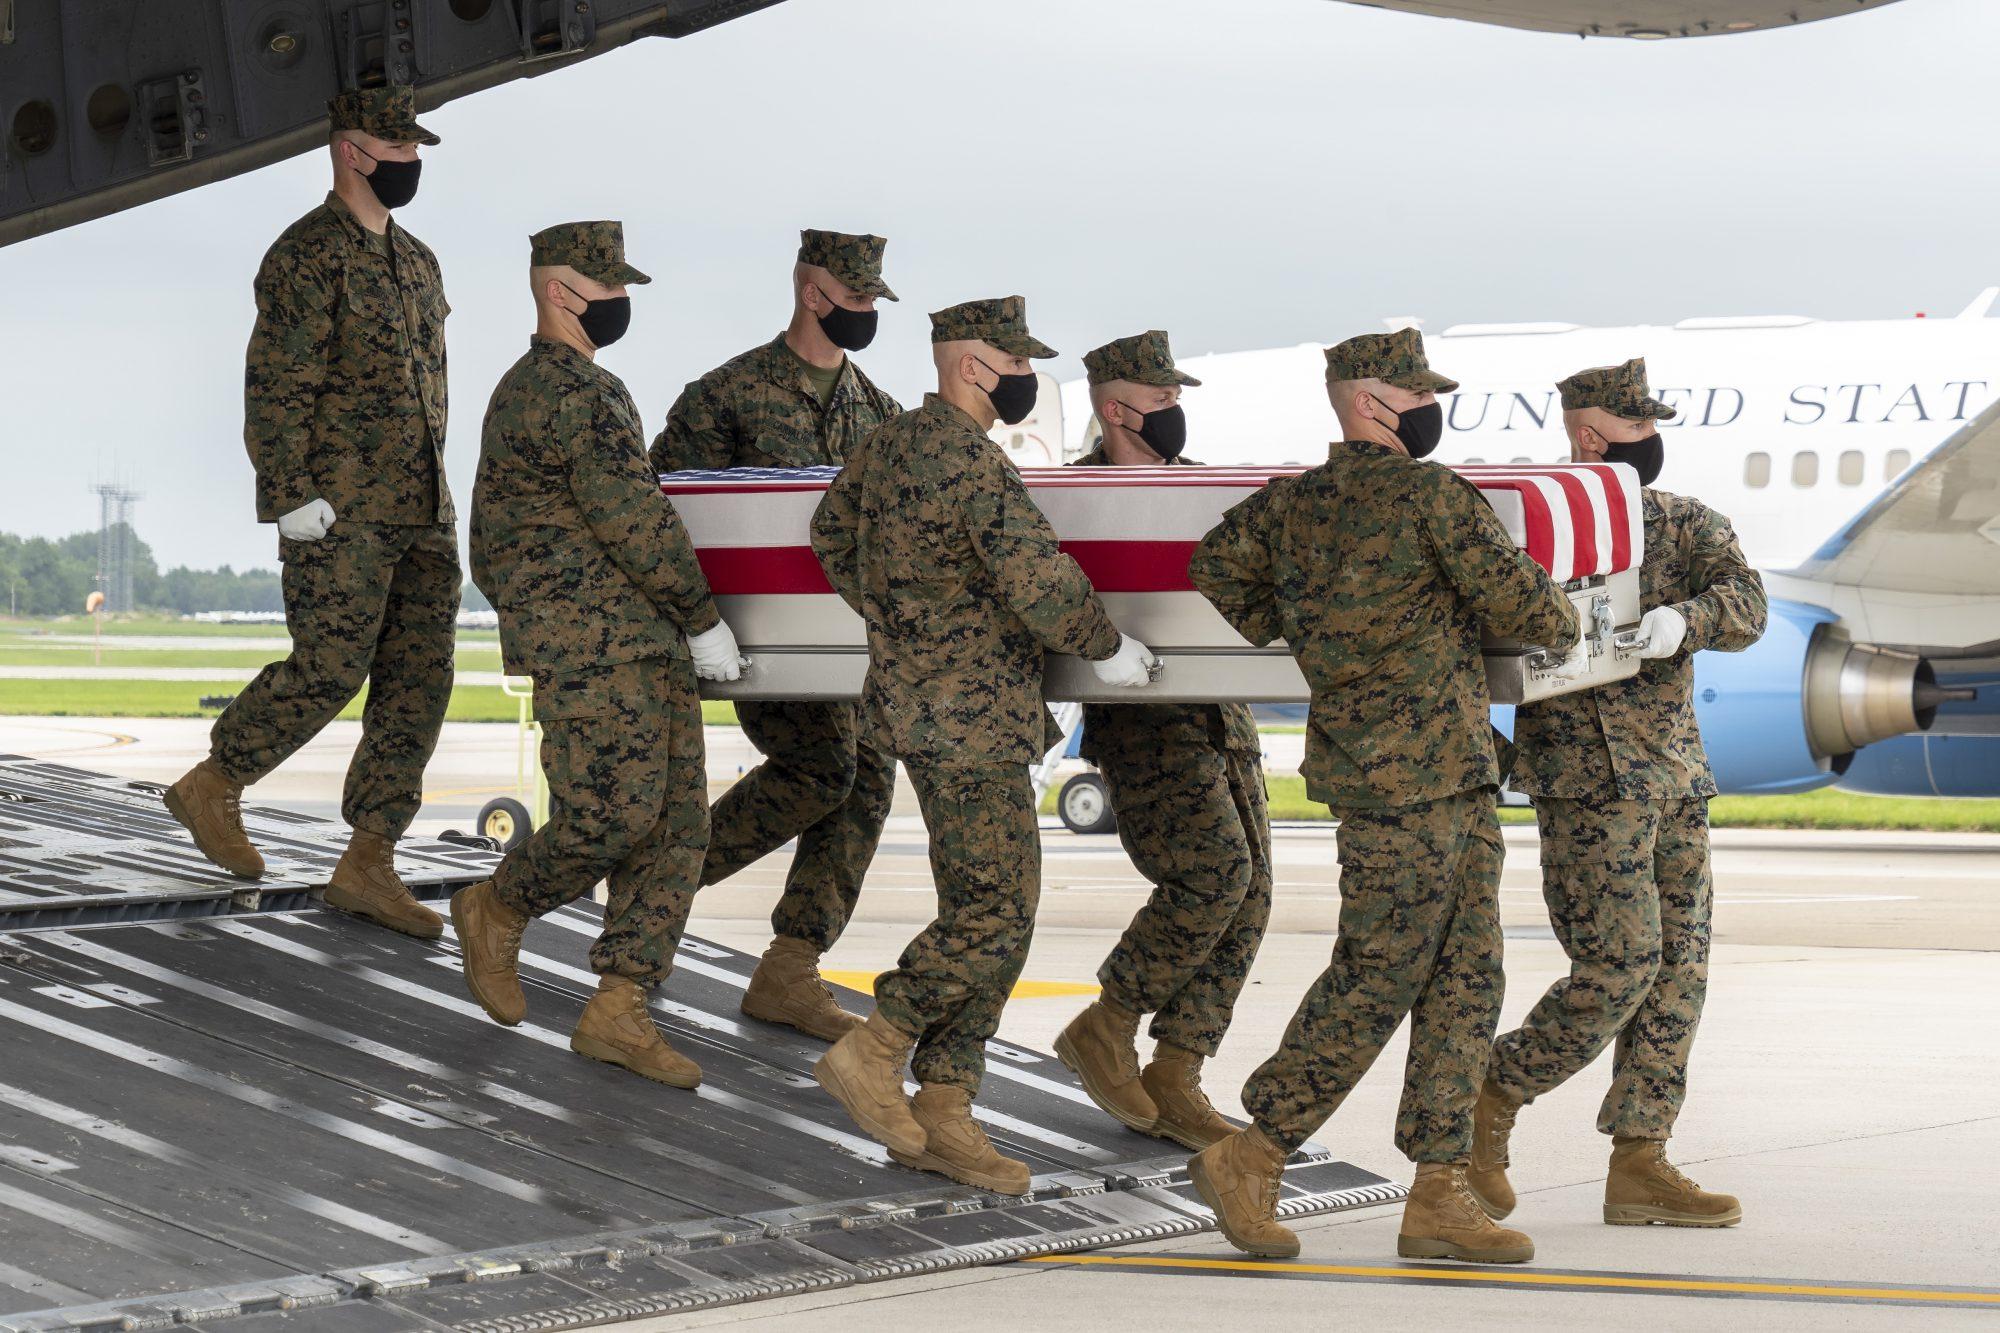 David L. Espinoza Dignifed Transfer Held For 13 Service Members Killed At Kabul Airport